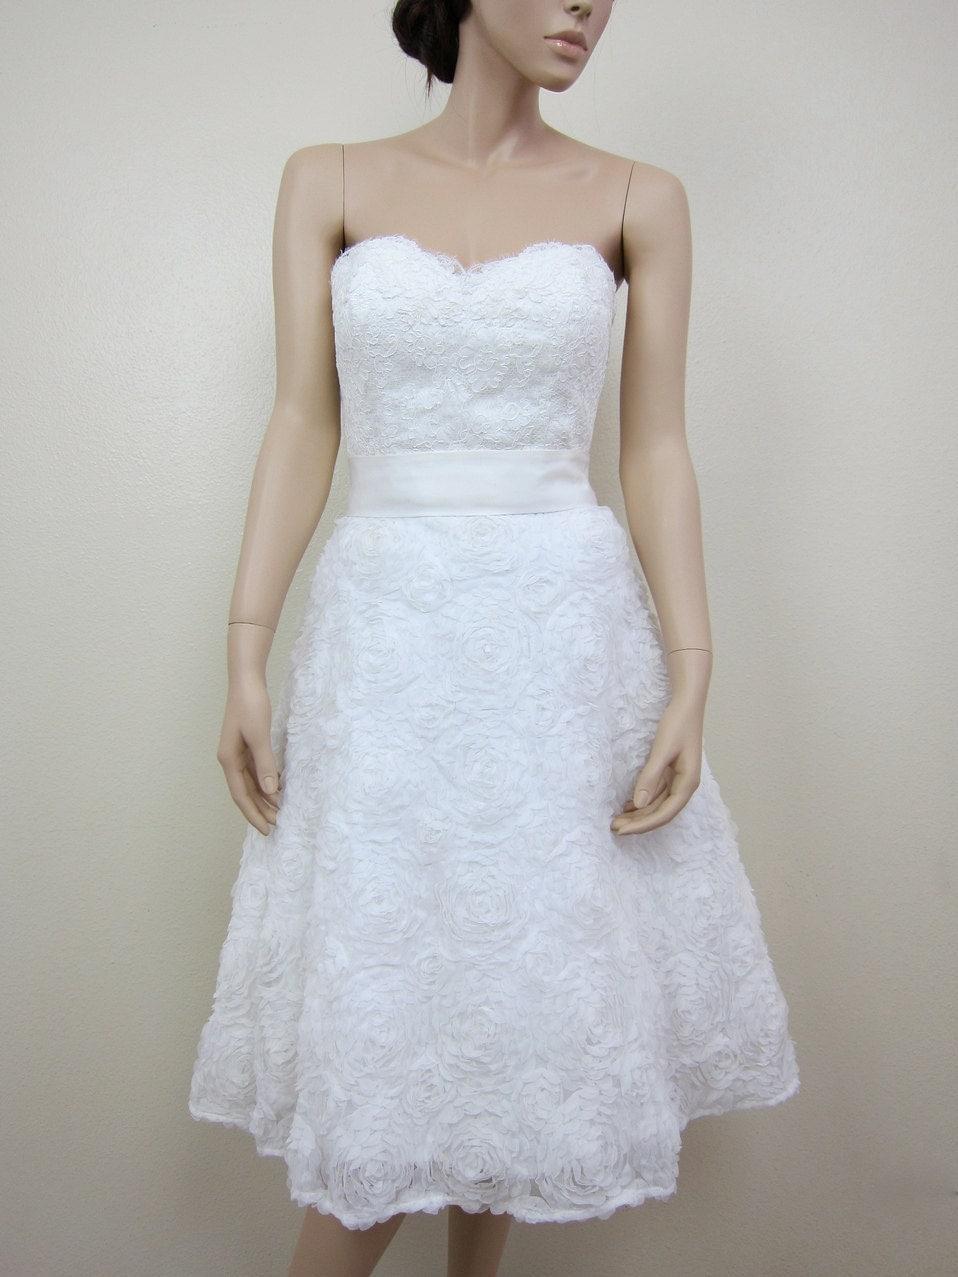 Ivory Strapless Tea Length Wedding Dress Alencon By Alexbridal